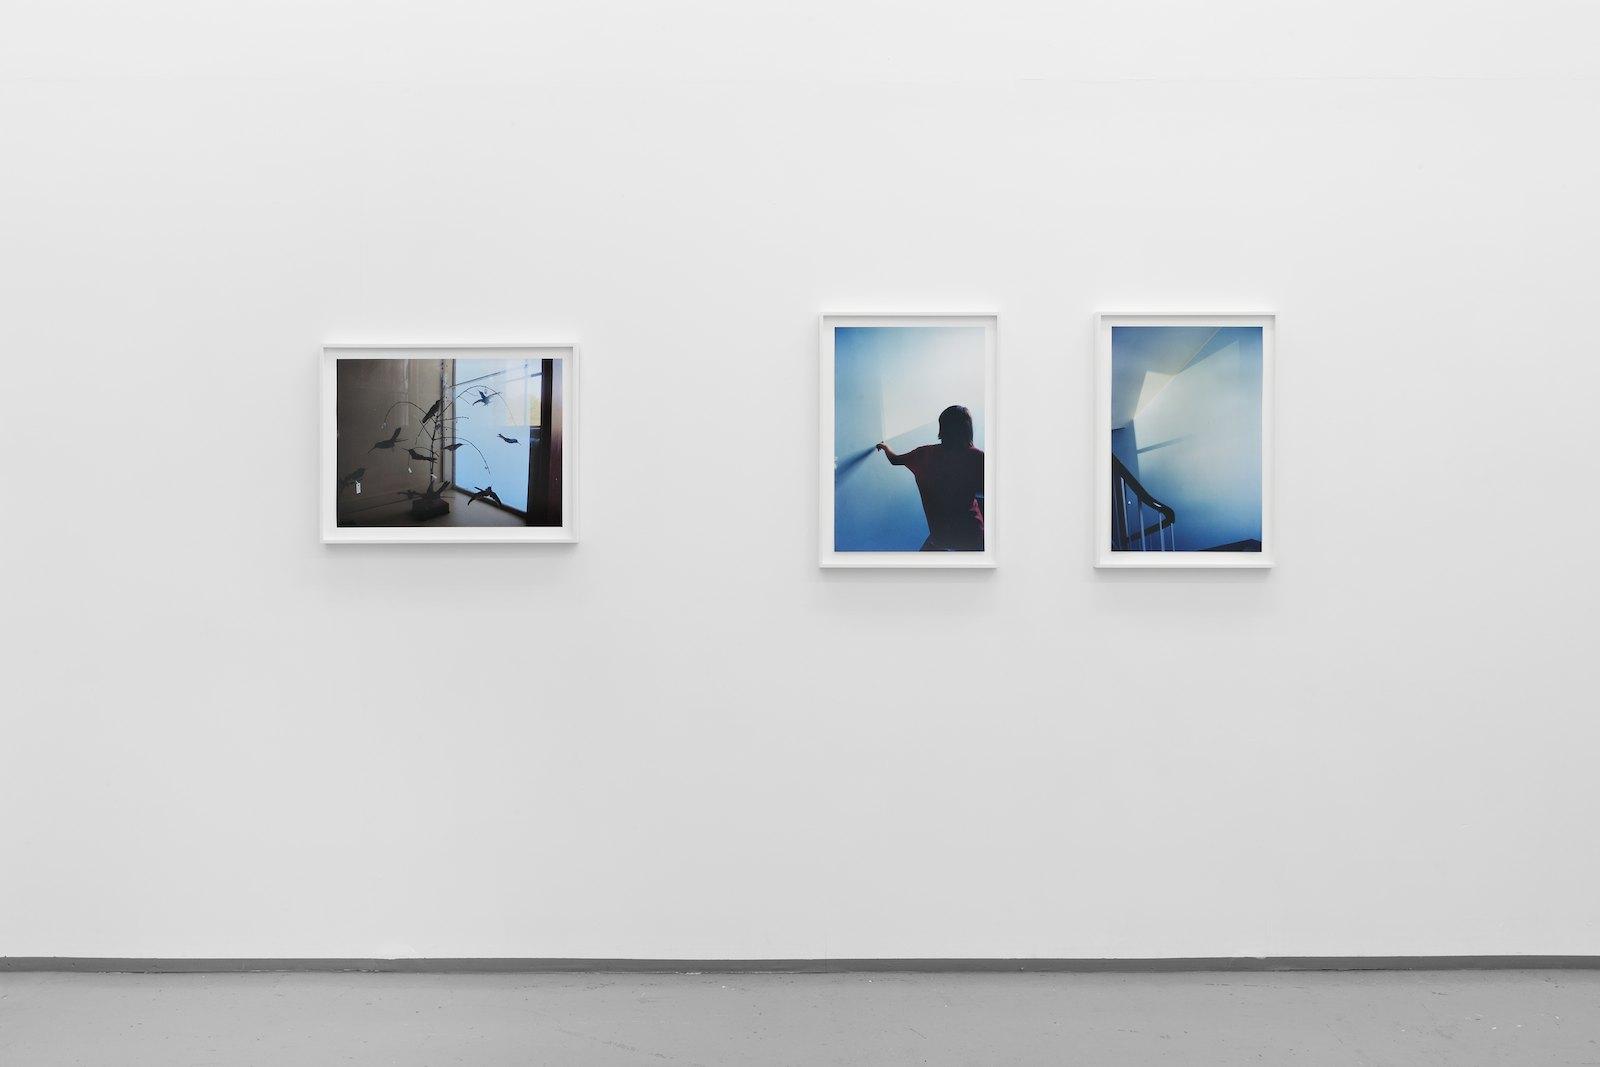 Installation view Eline Mugaas, I Make Another Room, Galleri Riis, Oslo, 2014